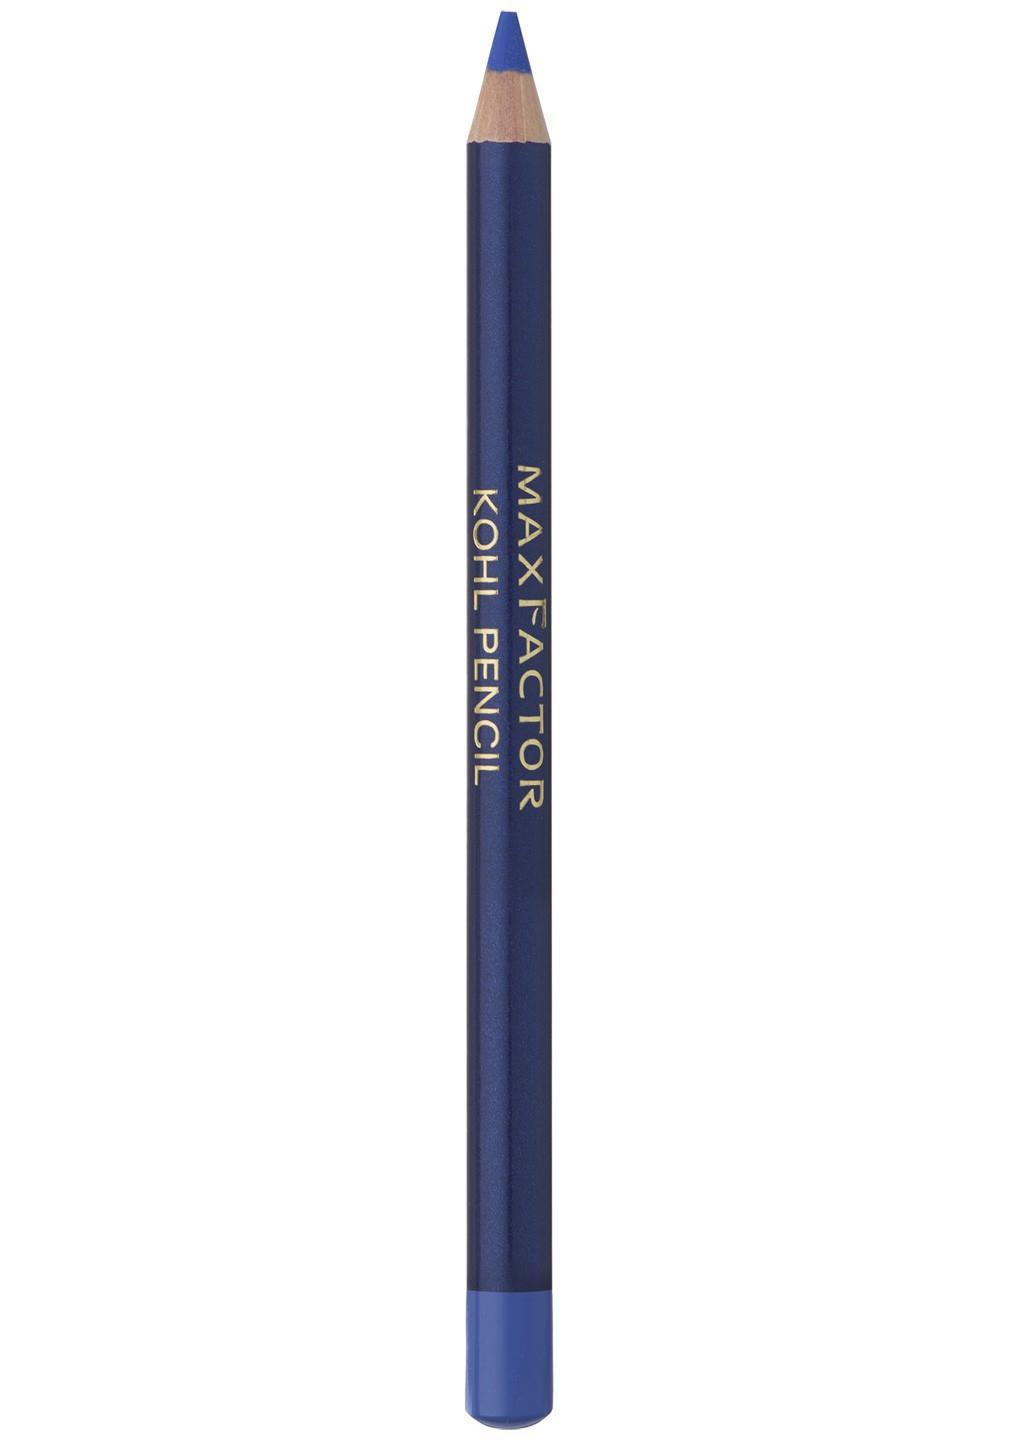 Max Factor Kohl Pencil 080